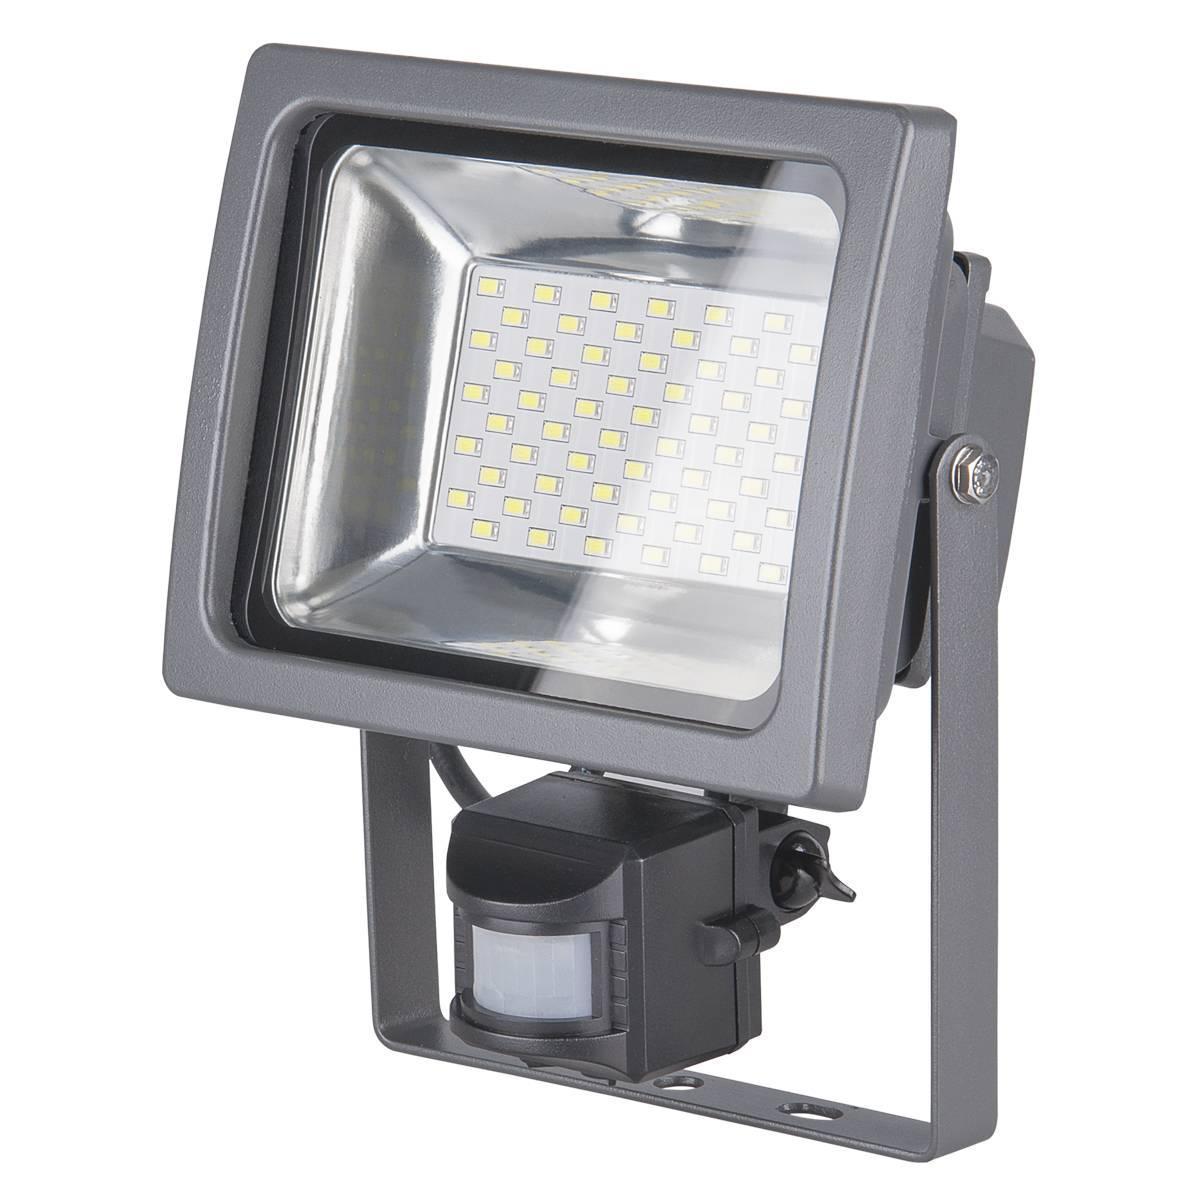 Прожектор светодиодный Elektrostandard 003 FL LED 30W 6500К 4690389080500 цена